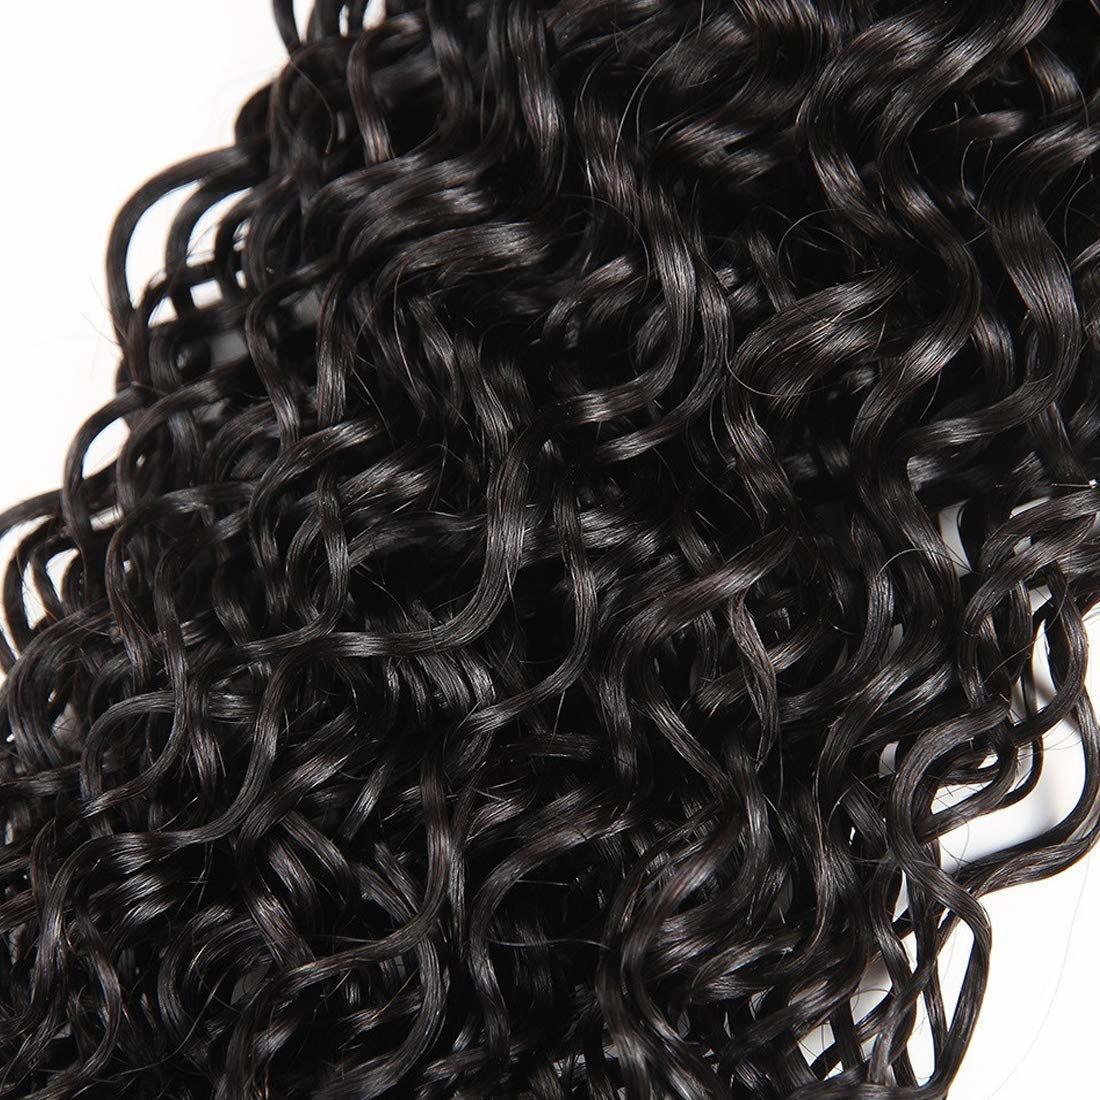 Brazilian Virgin Hair Water Wave Unprocessed Virgin Hair Extensions Water Wave Hair Wholesale Hair